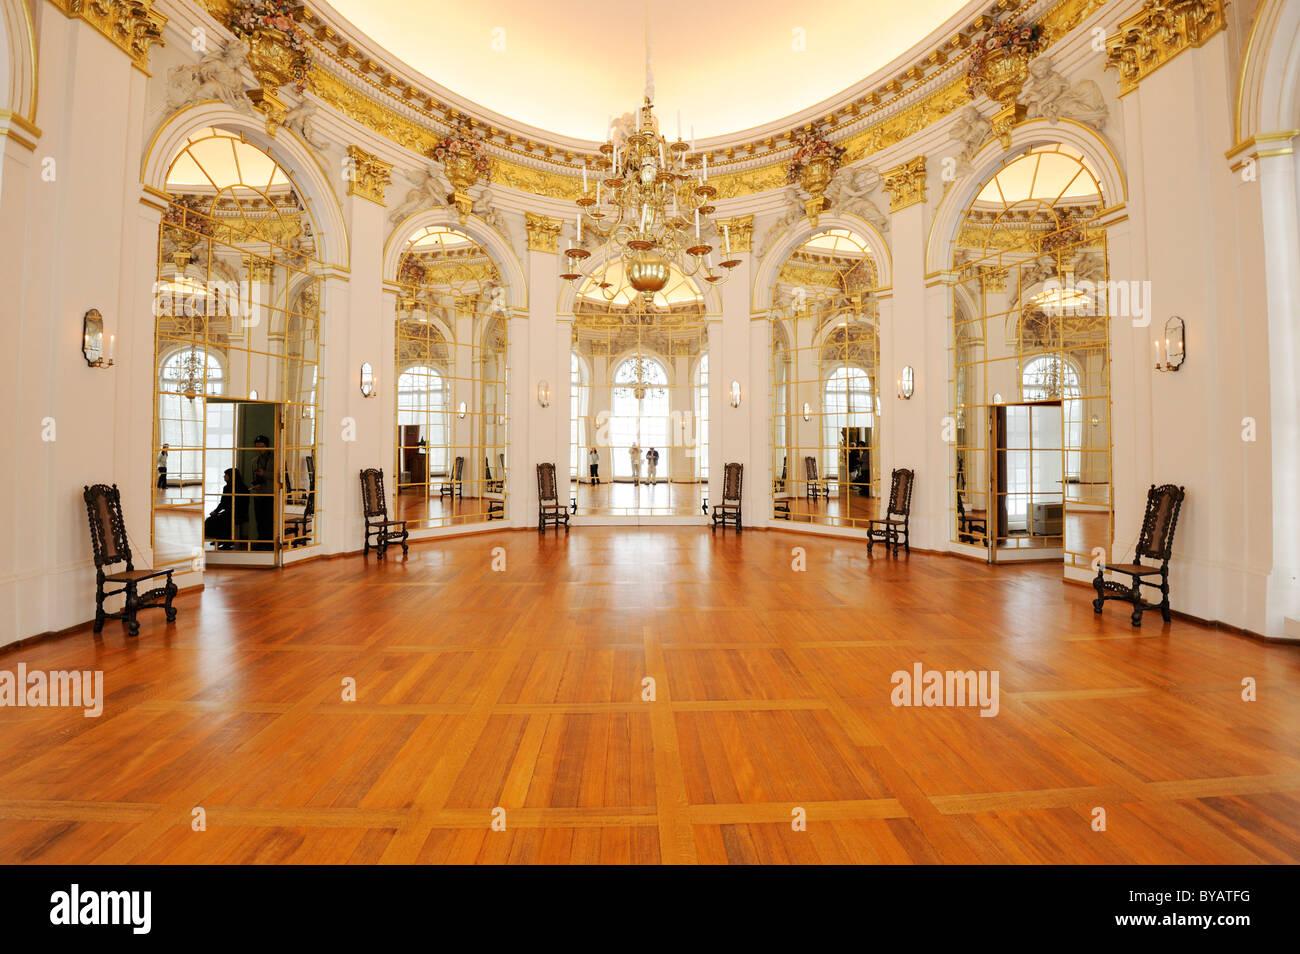 Ovaler Saal im Schloss Schloss Charlottenburg, Berlin, Deutschland, Europa Stockbild